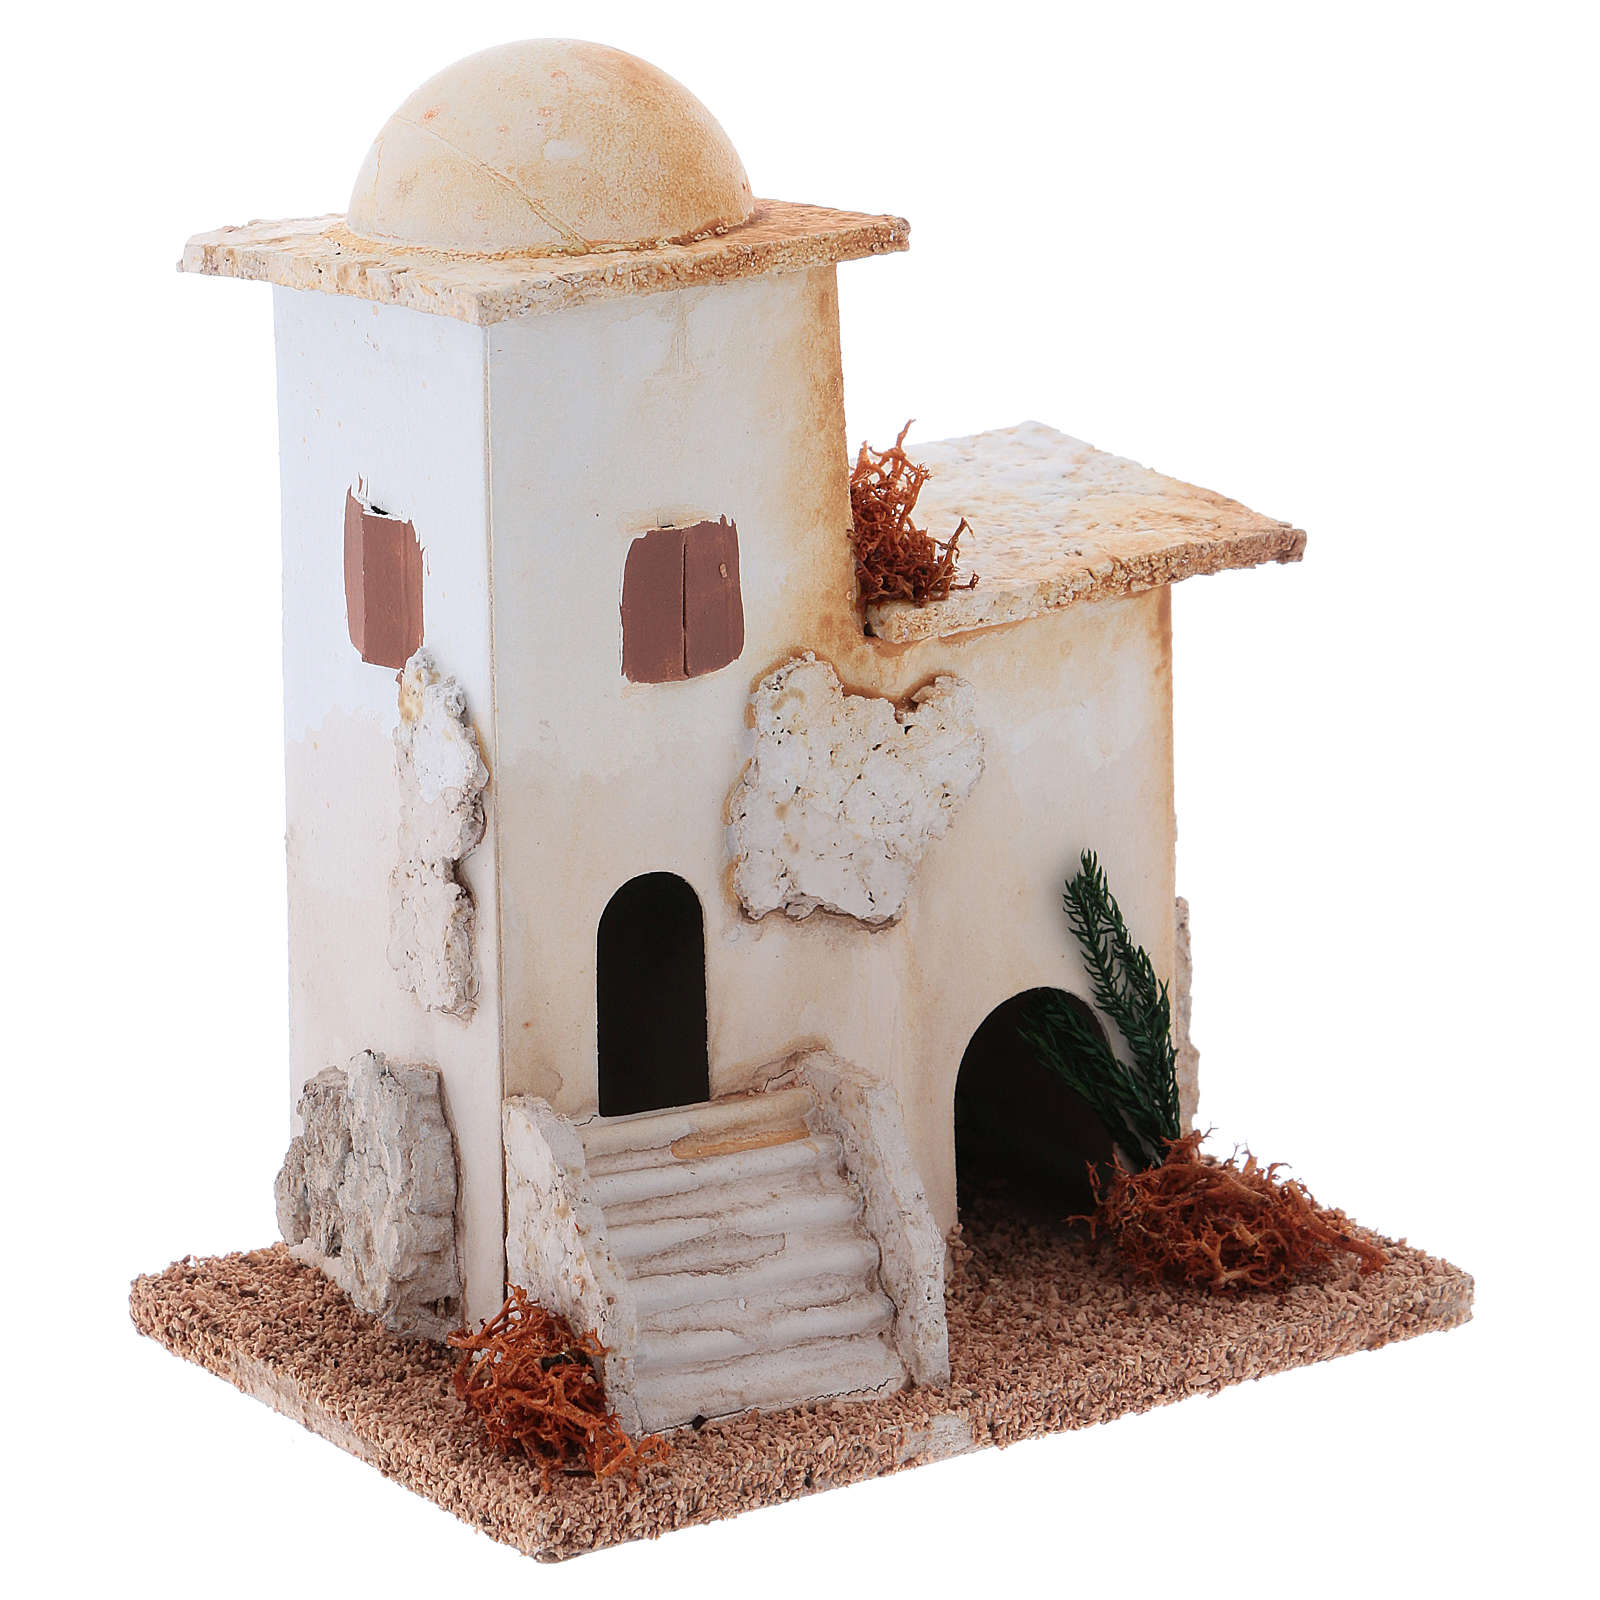 Minareto per presepe 10x10x10 cm 4